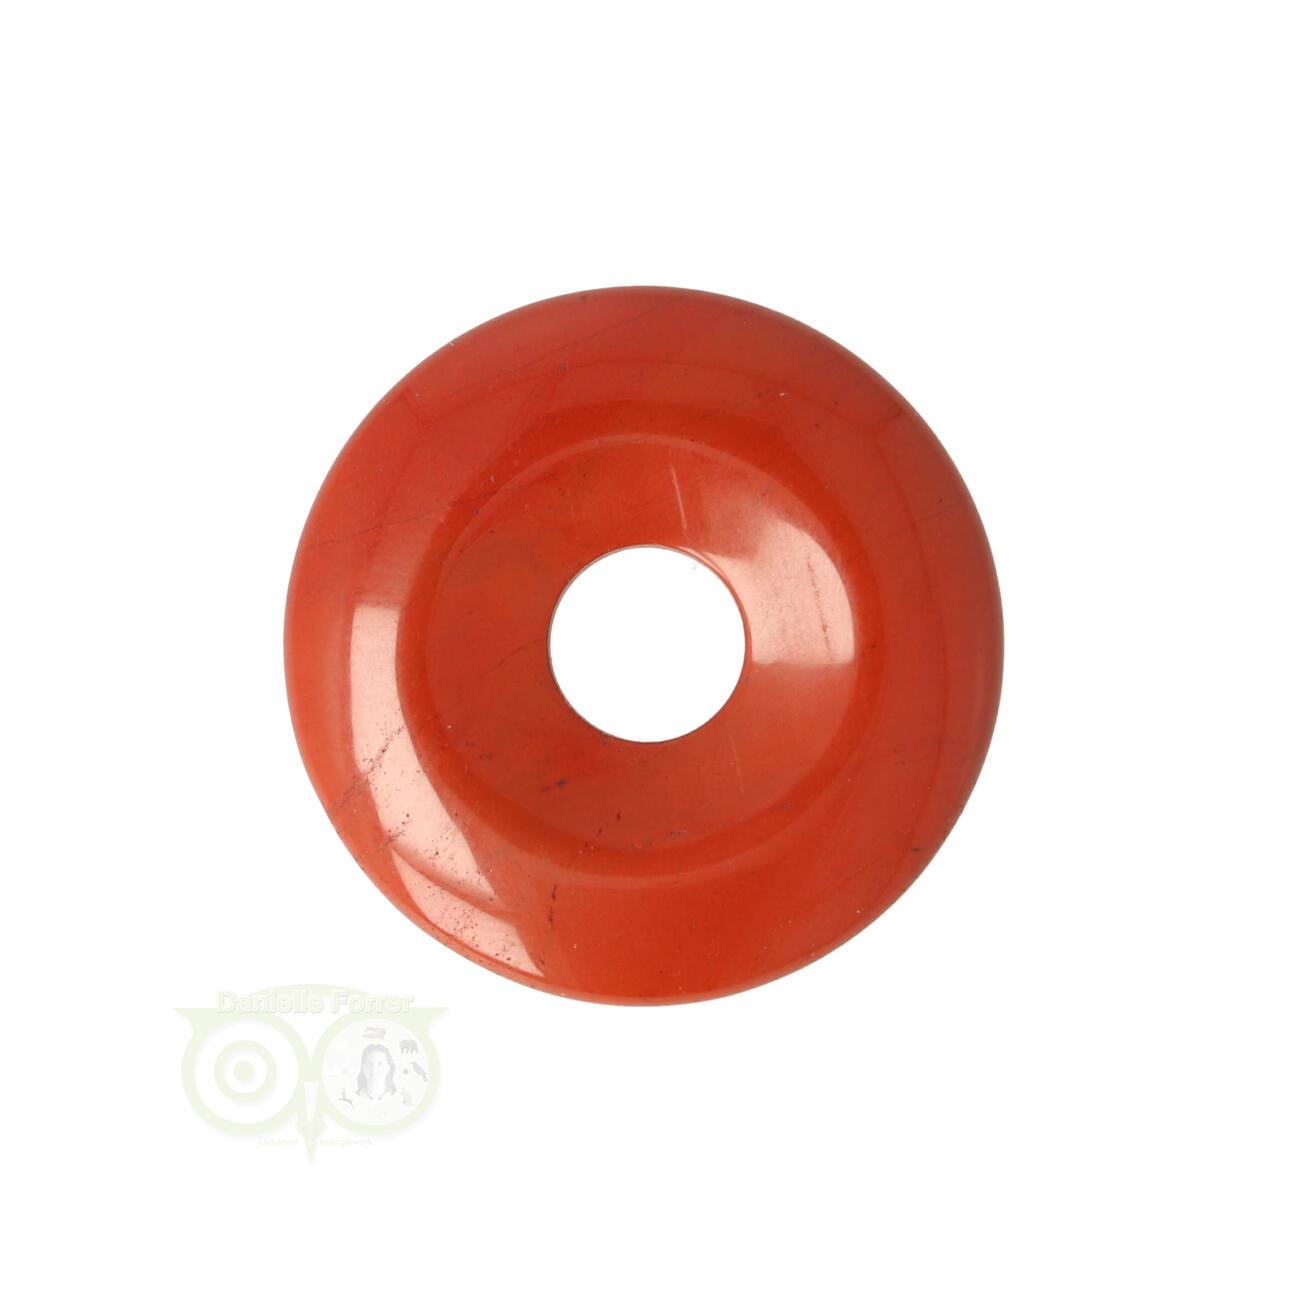 Rode Jaspis Edelstenen donut hangers | Edelstenen Webwinkel - Webshop Danielle Forrer